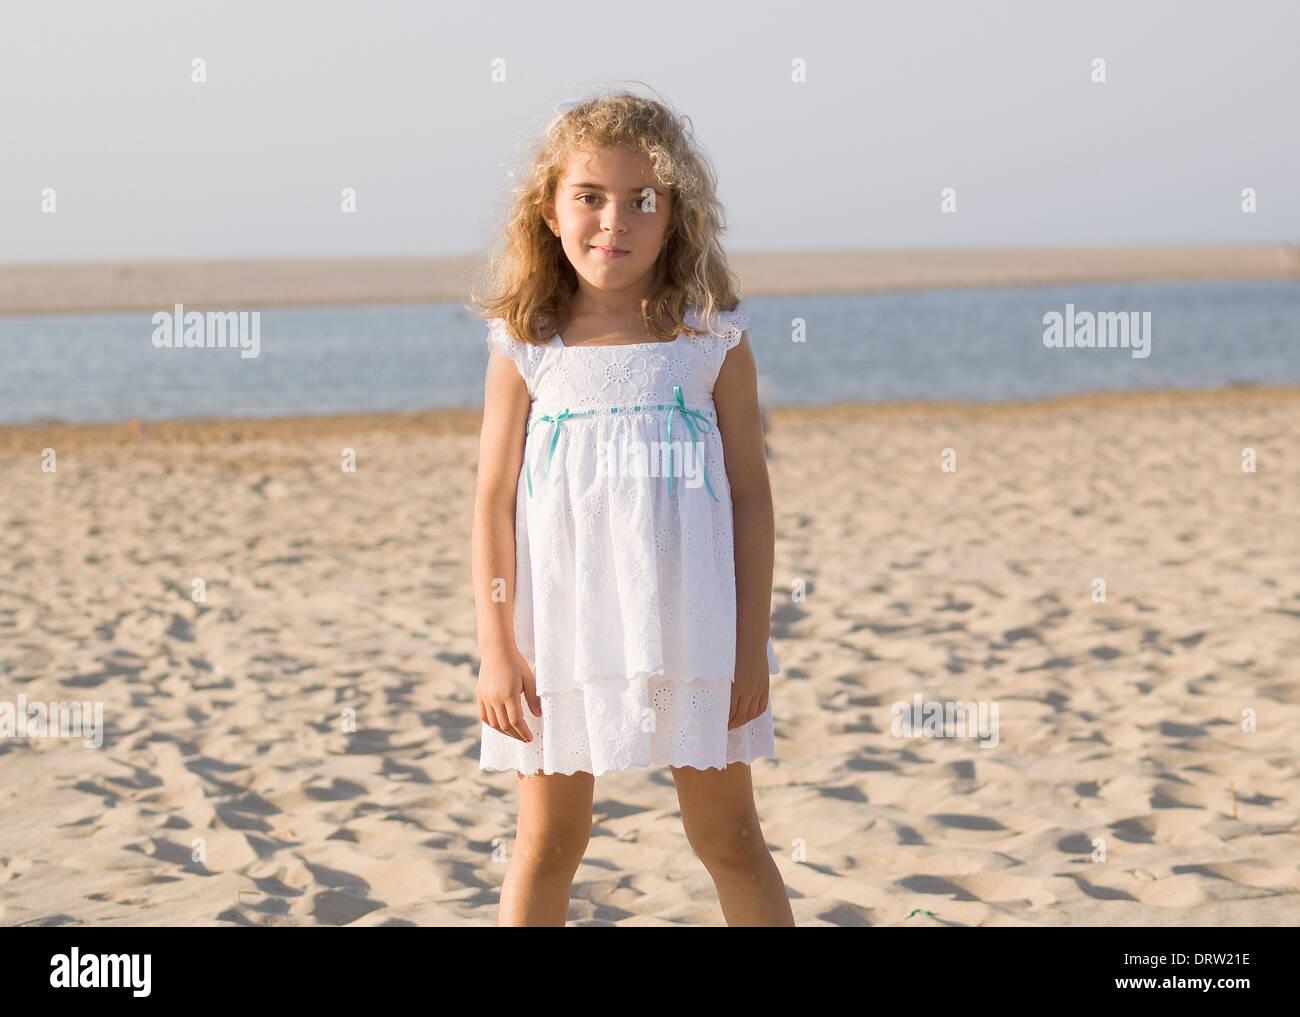 little girl pose beach Alamy